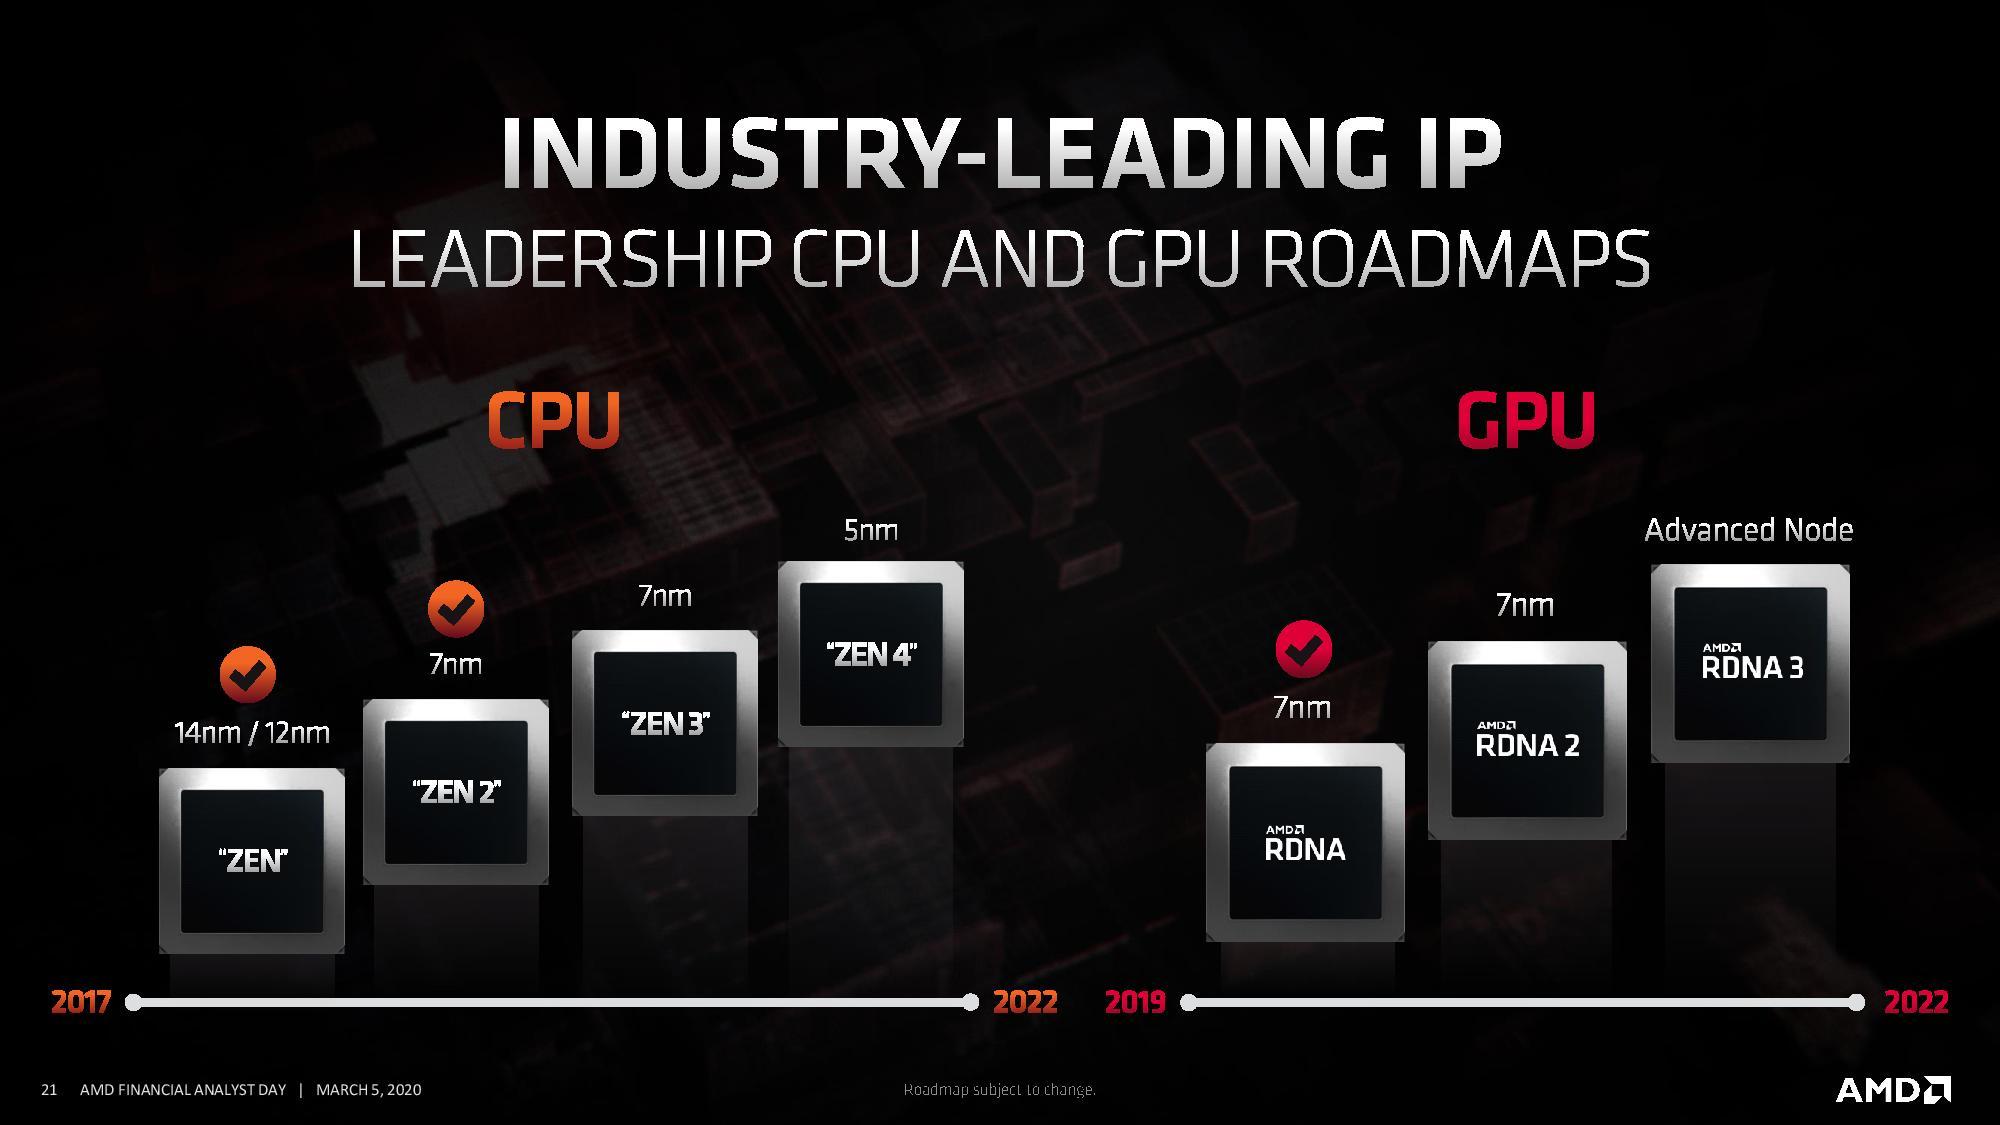 wrpusr5p4xq44cjri6ocbw AMD ยืนยันเตรียมพร้อมเปิดตัวซีพียู ZEN4 และการ์ดจอ RDNA3 สถาปัตย์ขนาด 5nm ในปี 2022 อย่างแน่นอน